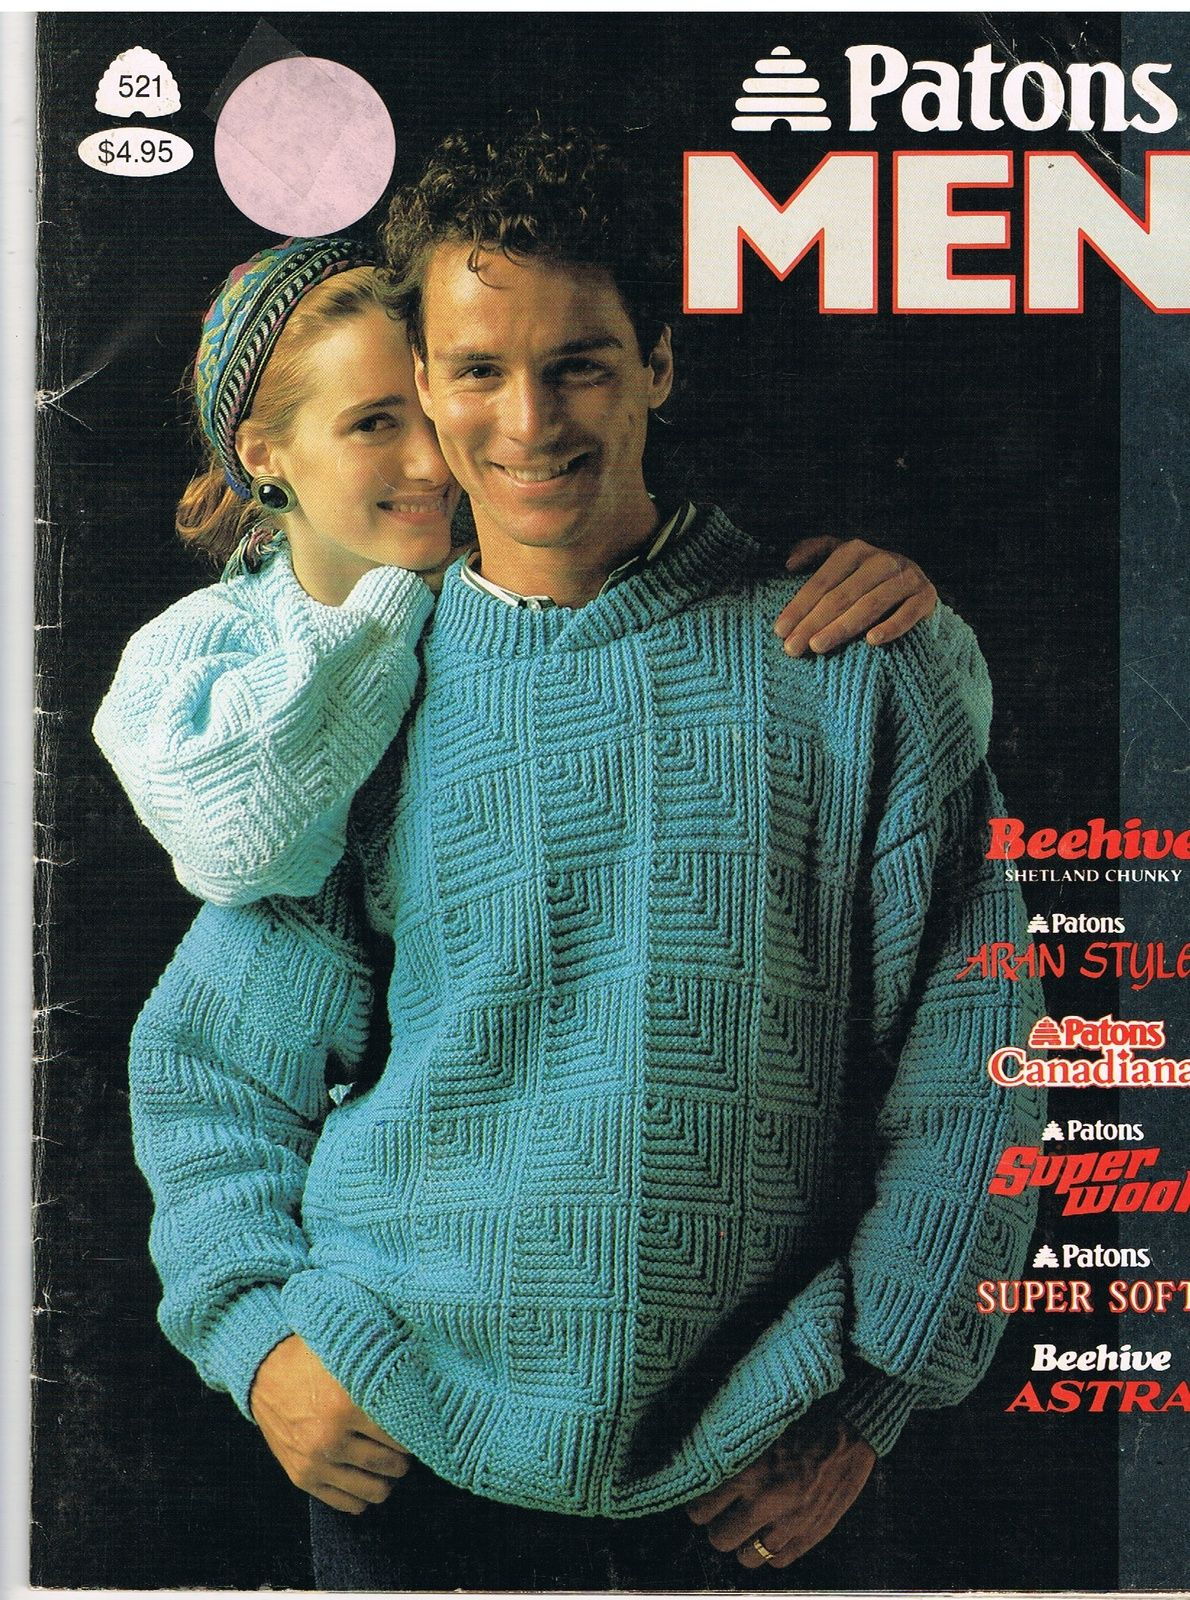 Patons Knitting for Men Pattern Book   Pattern books, Knitting ...